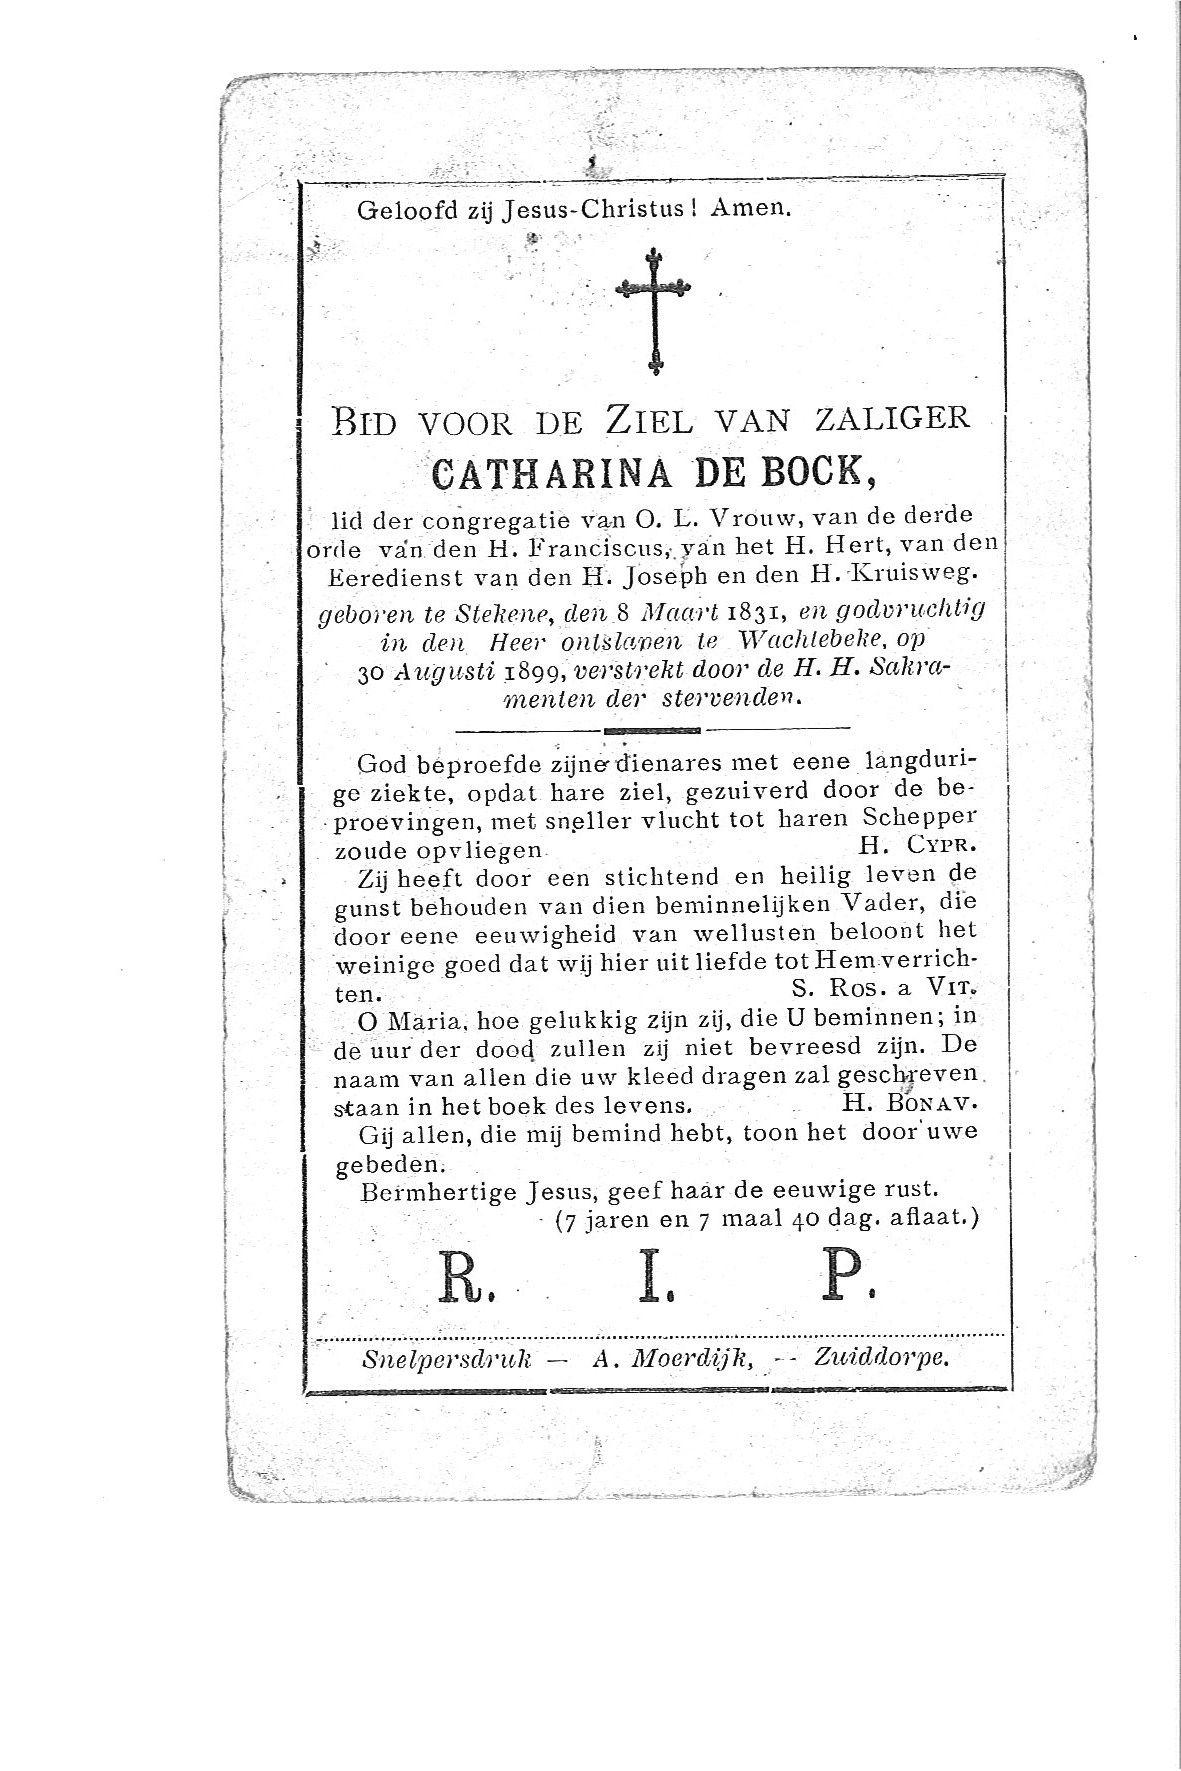 catharina-(1899)20090330085831_00008.jpg